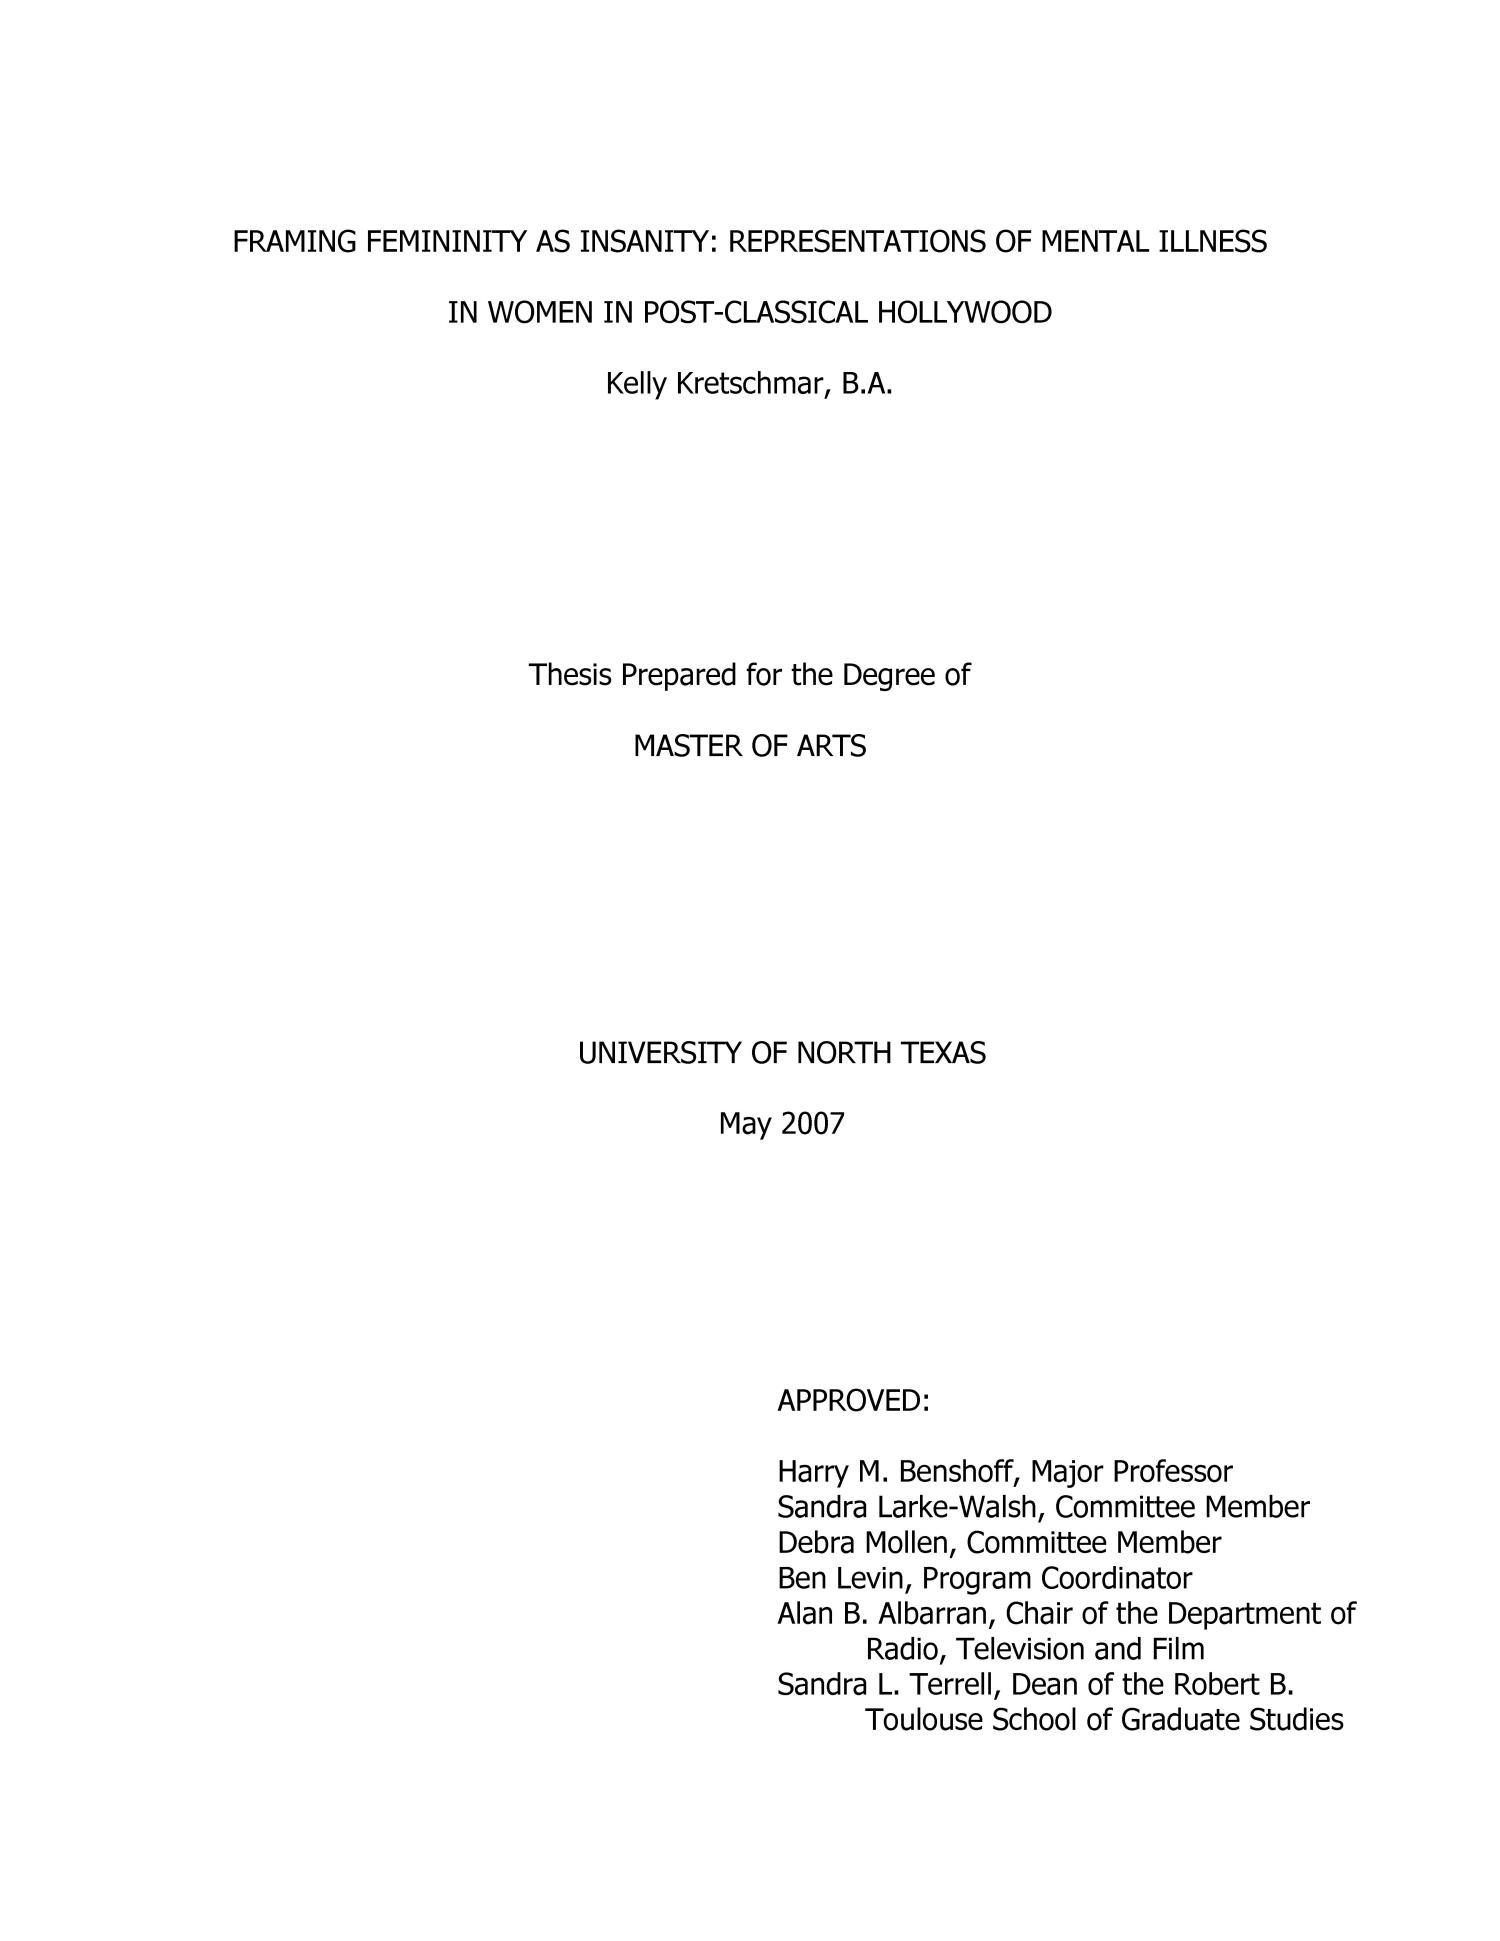 Mental illness thesis